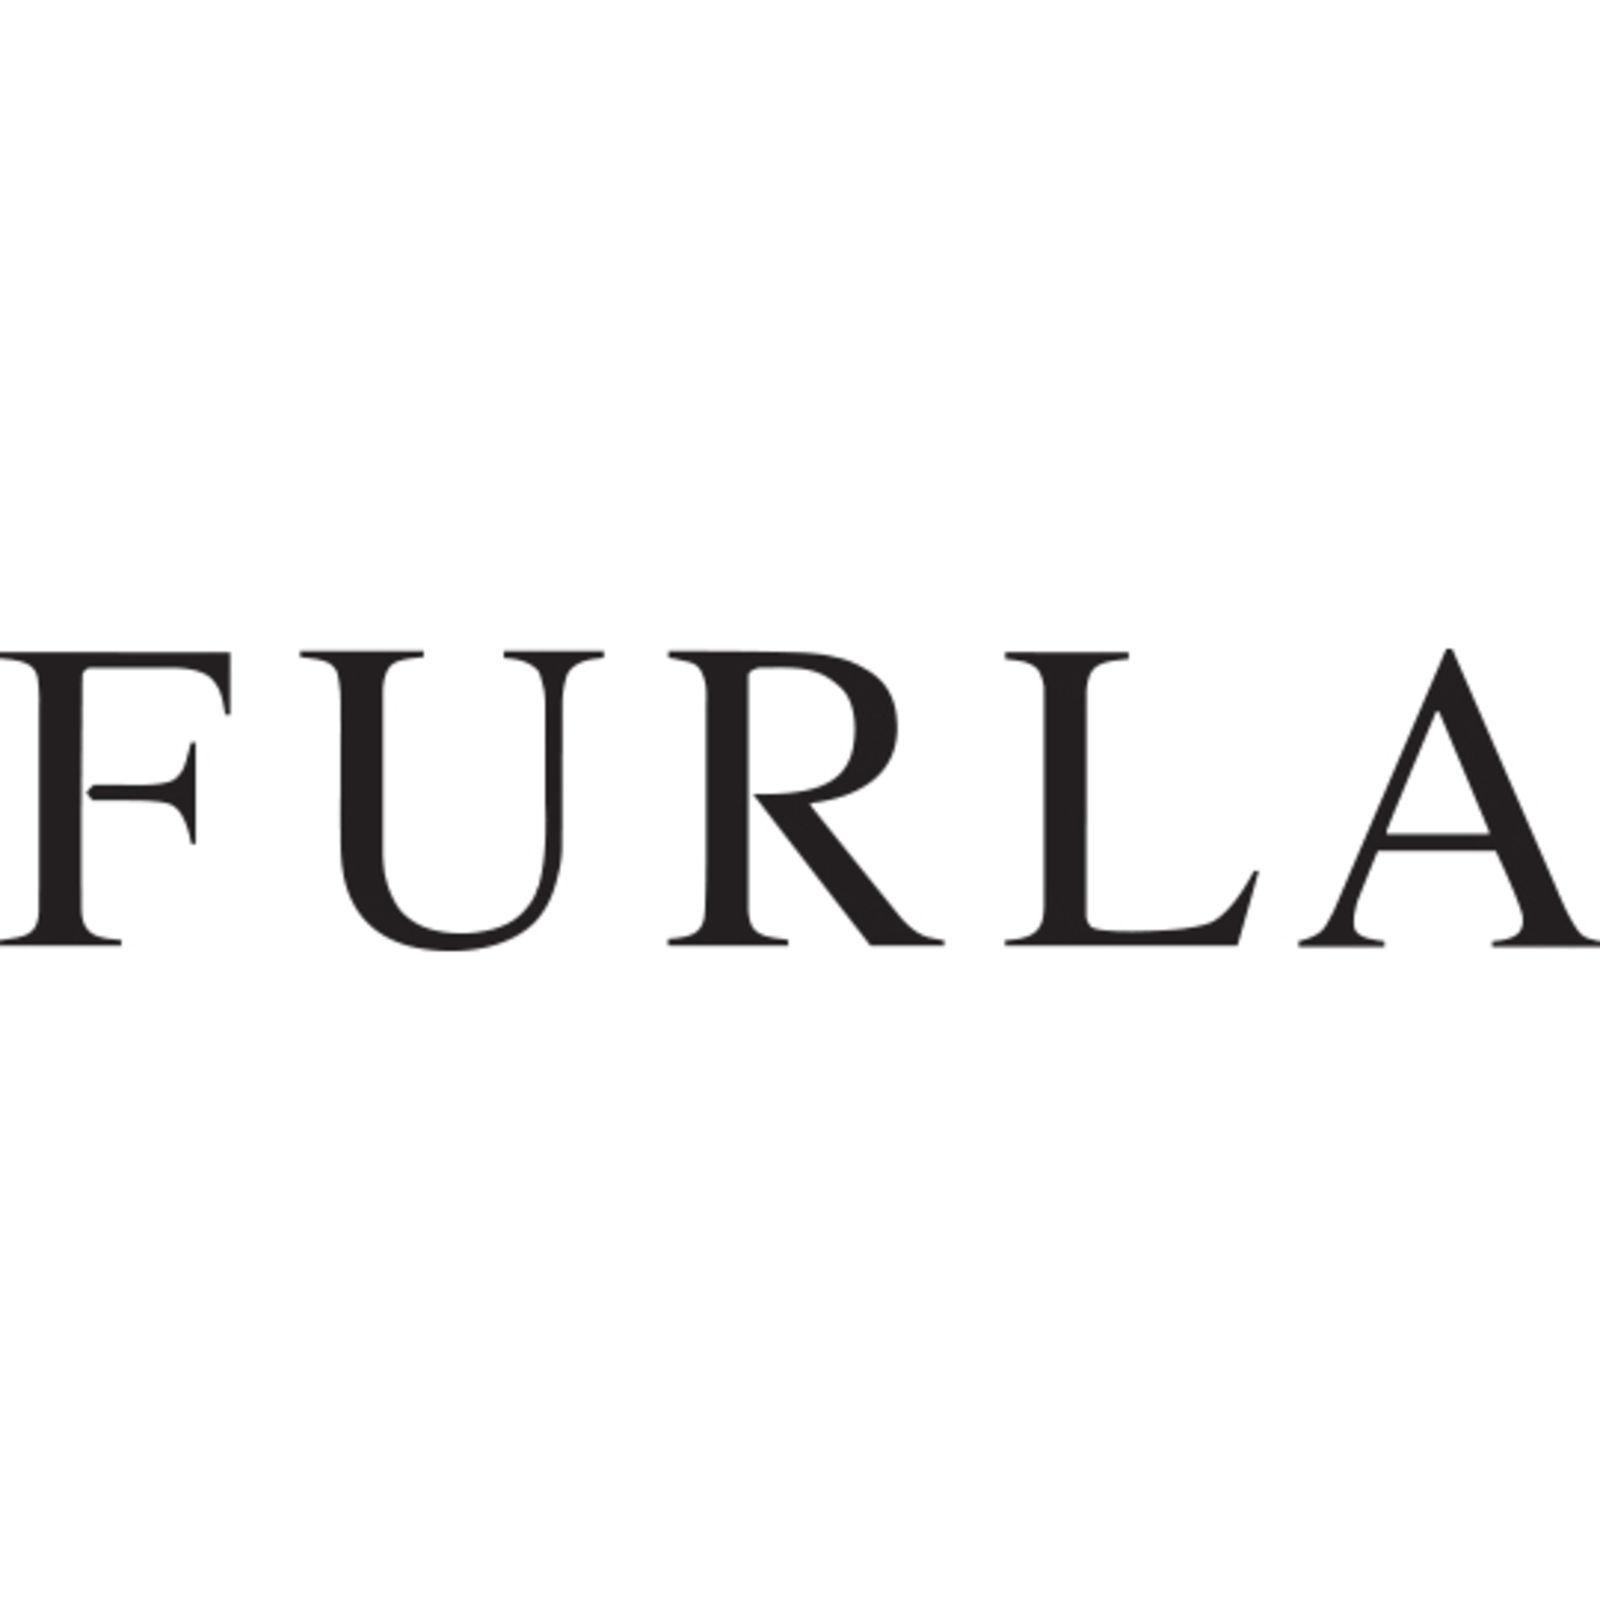 FURLA (Image 1)